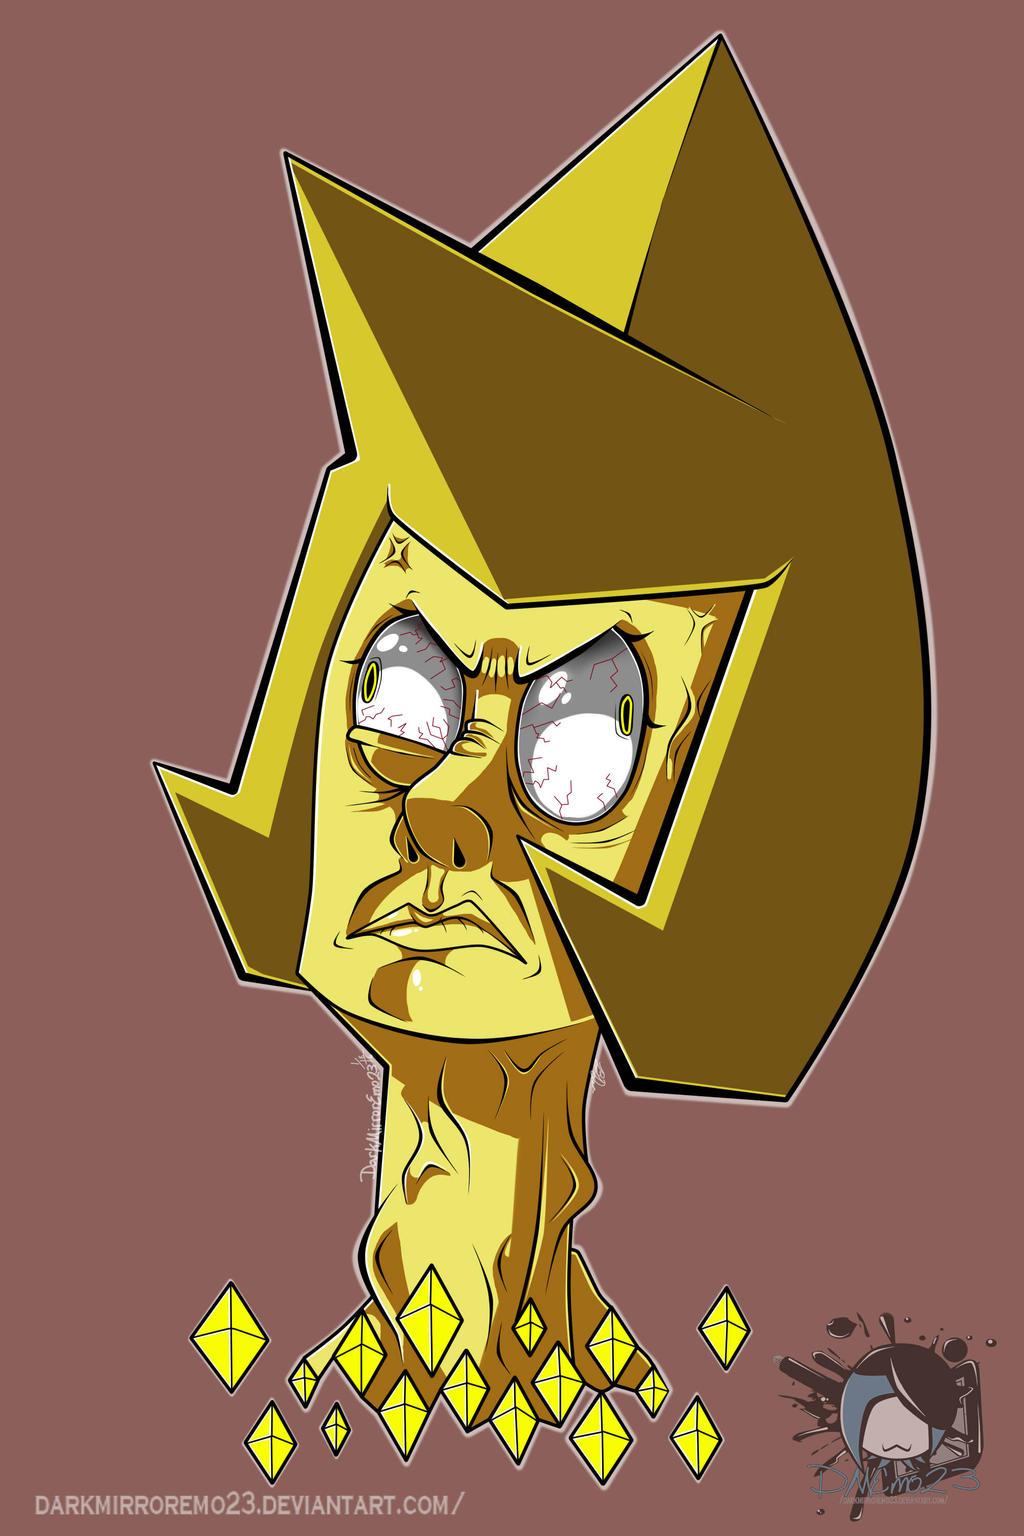 Steven Universe: Yellow Diamond by DarkMirrorEmo23